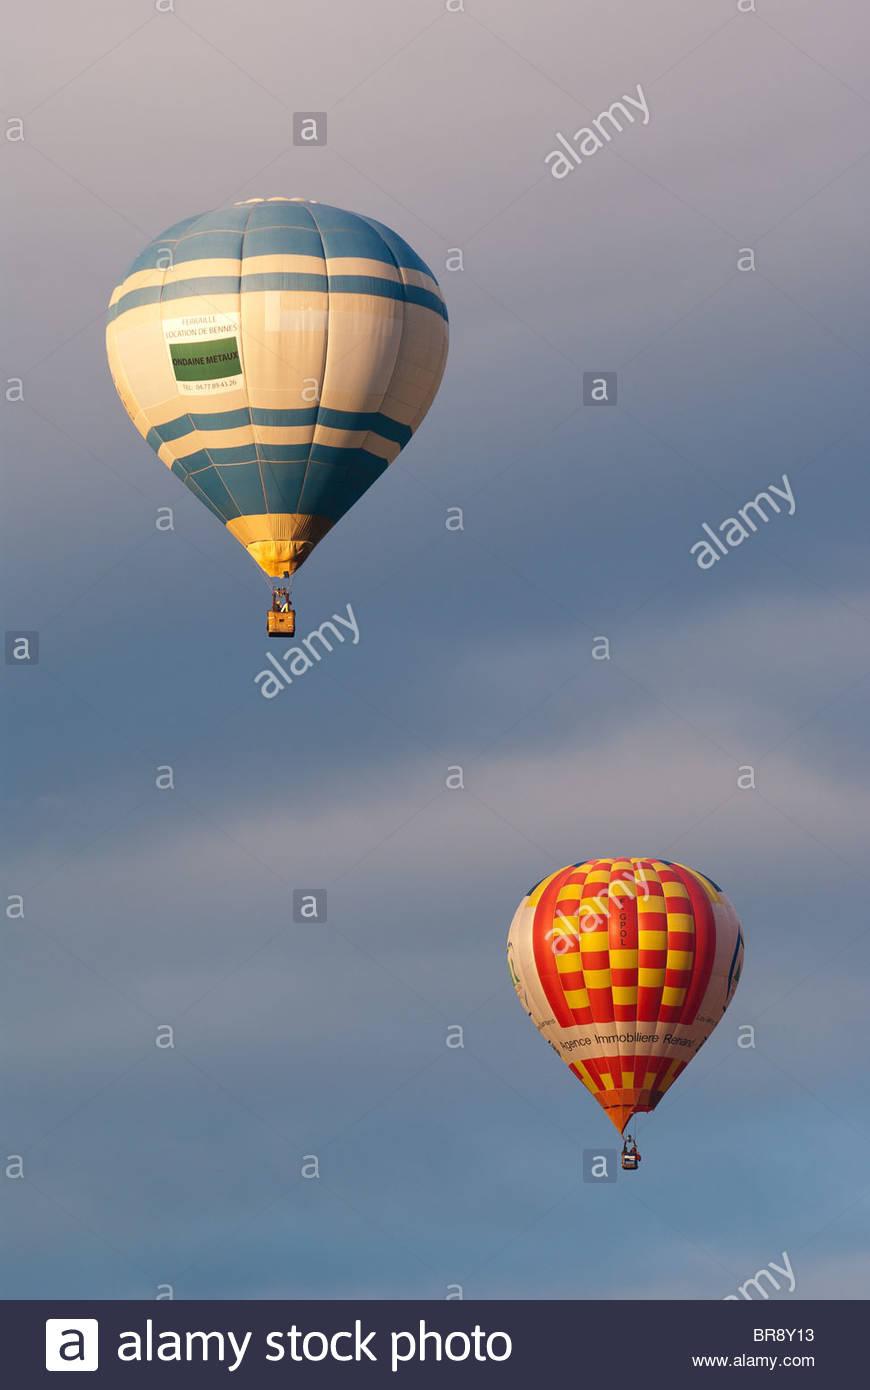 Palloni Ad Aria Calda.I Palloni Ad Aria Calda Foto Immagine Stock 31544271 Alamy